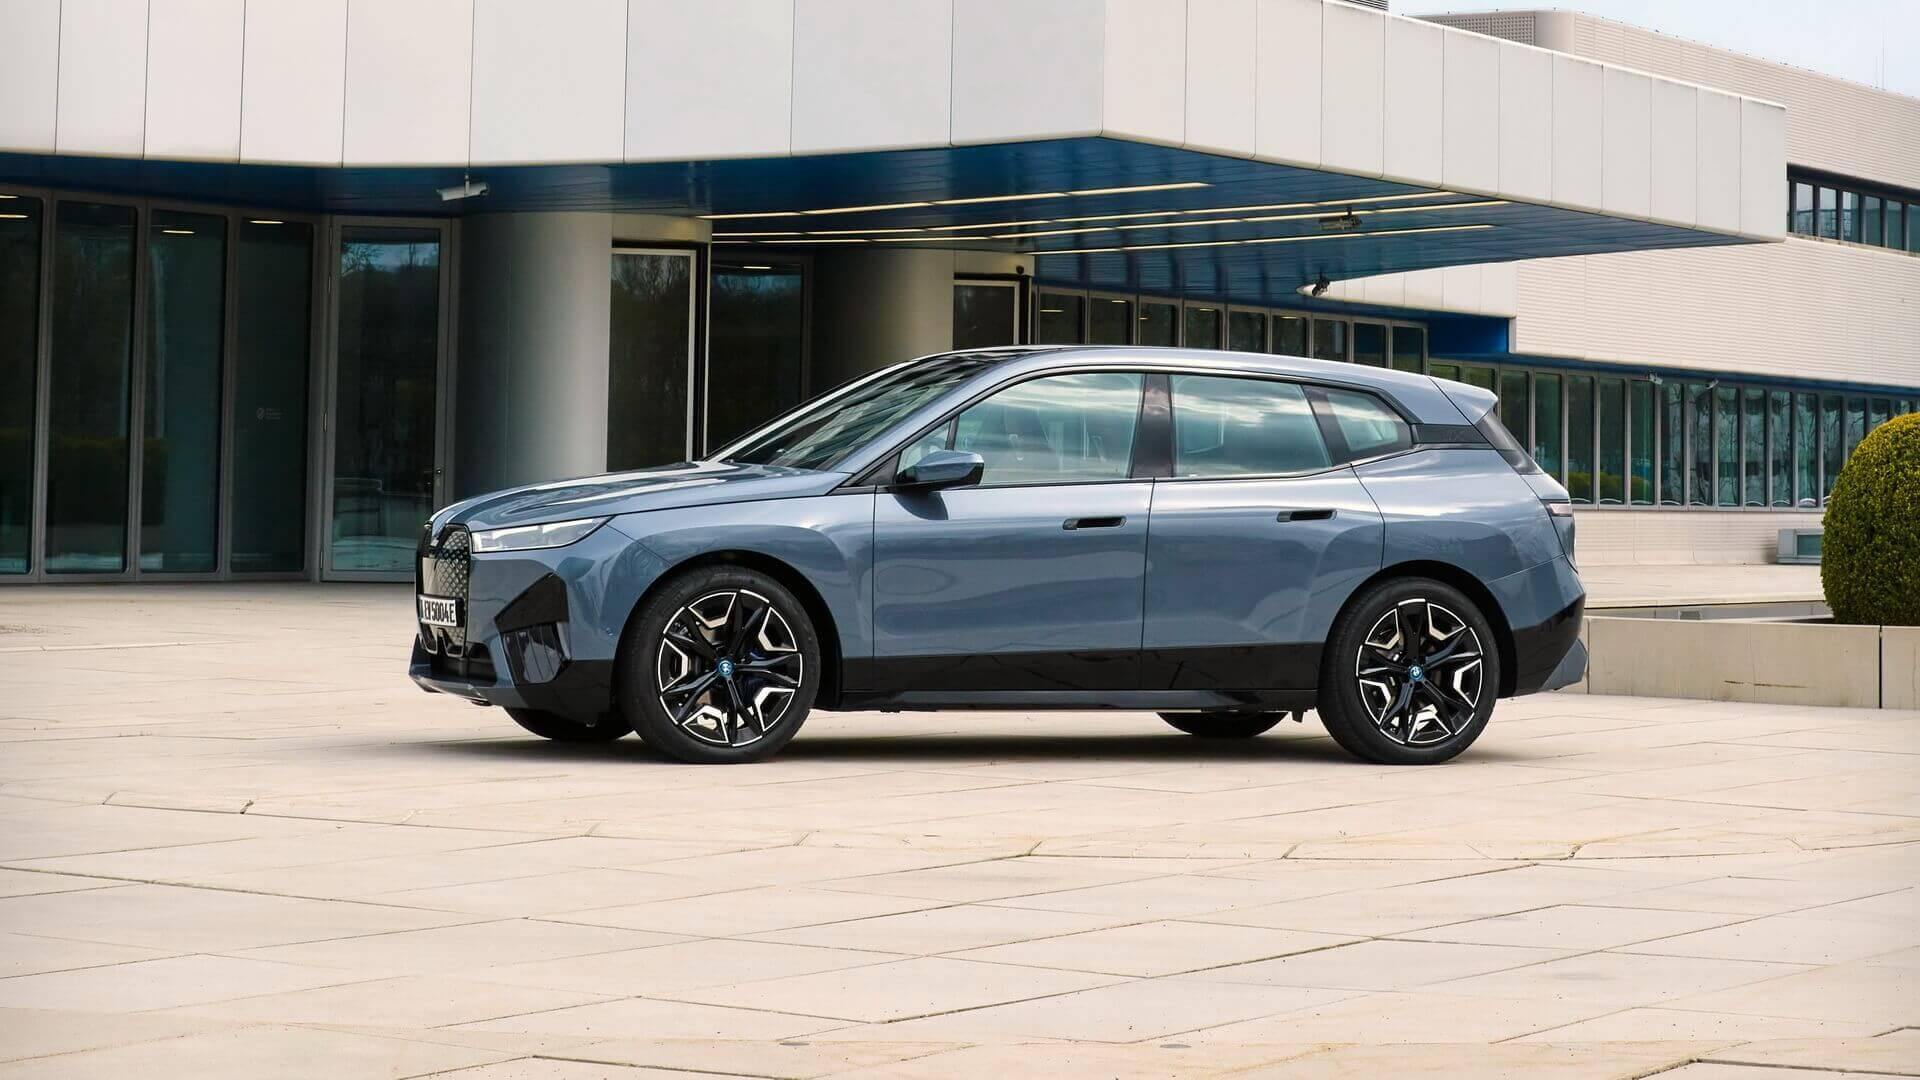 Первоначально BMW iX будет доступен в двух версиях: xDrive40 и xDrive50